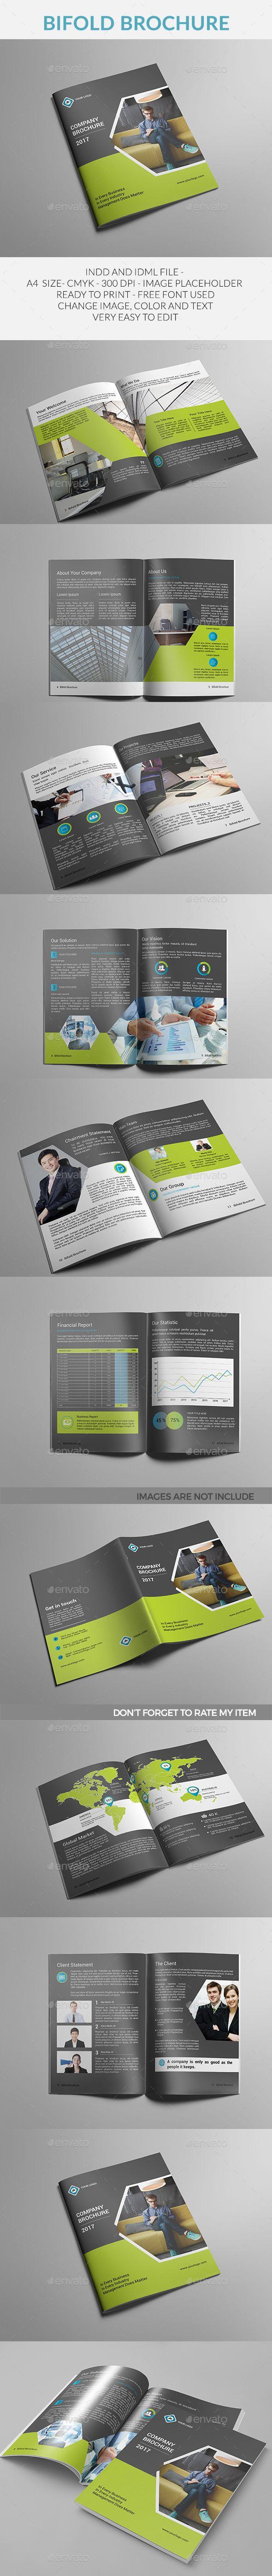 Bifold Brochure Template InDesign INDD